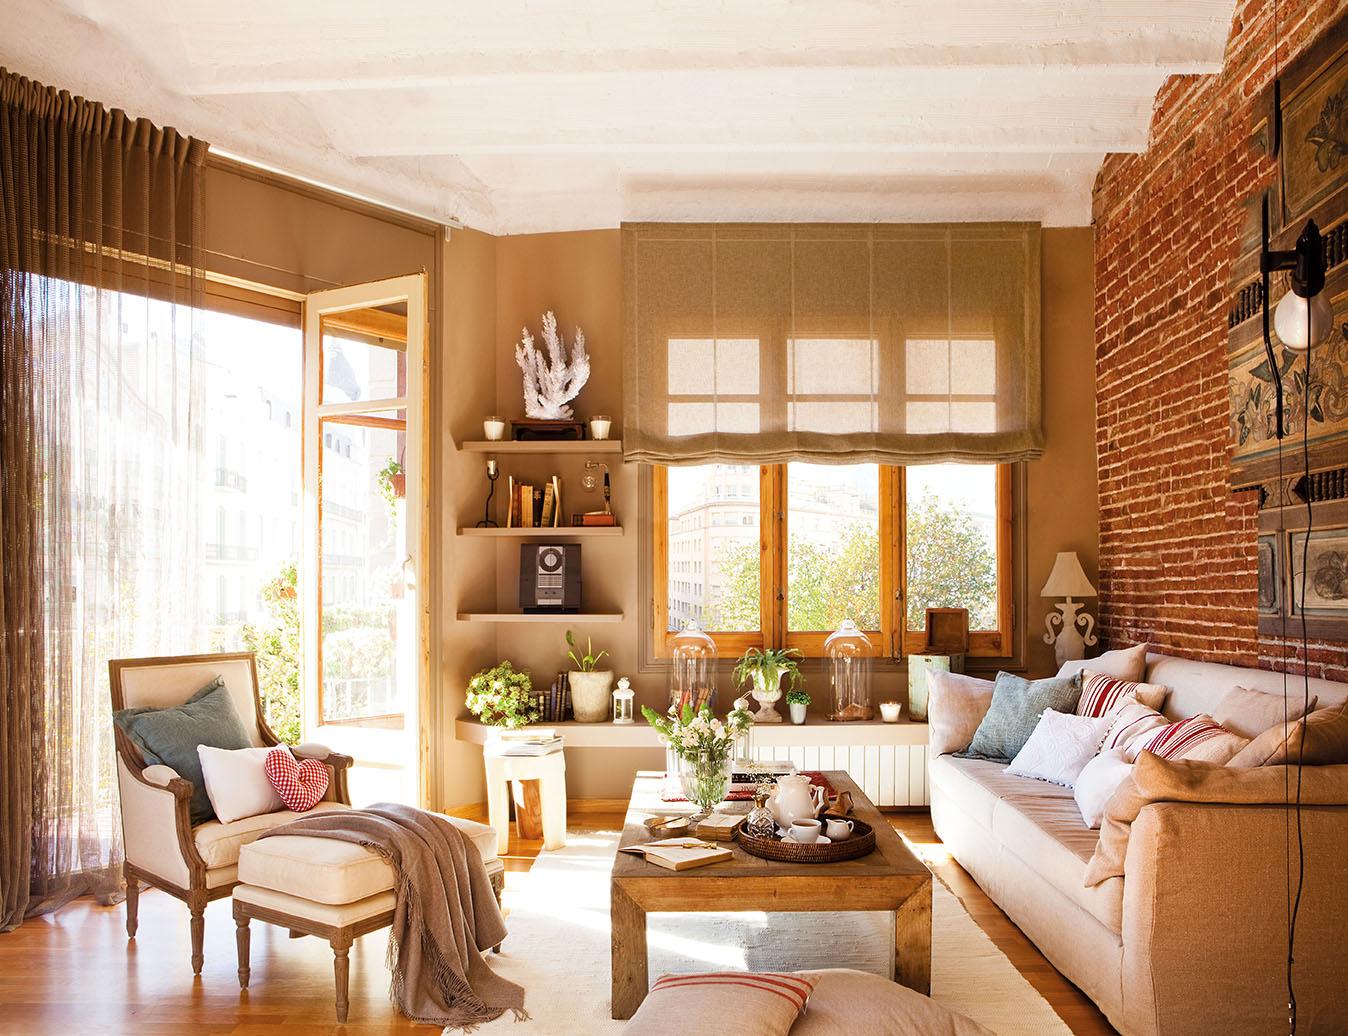 Decoracion De Viviendas Interiores Tips Para Decorar